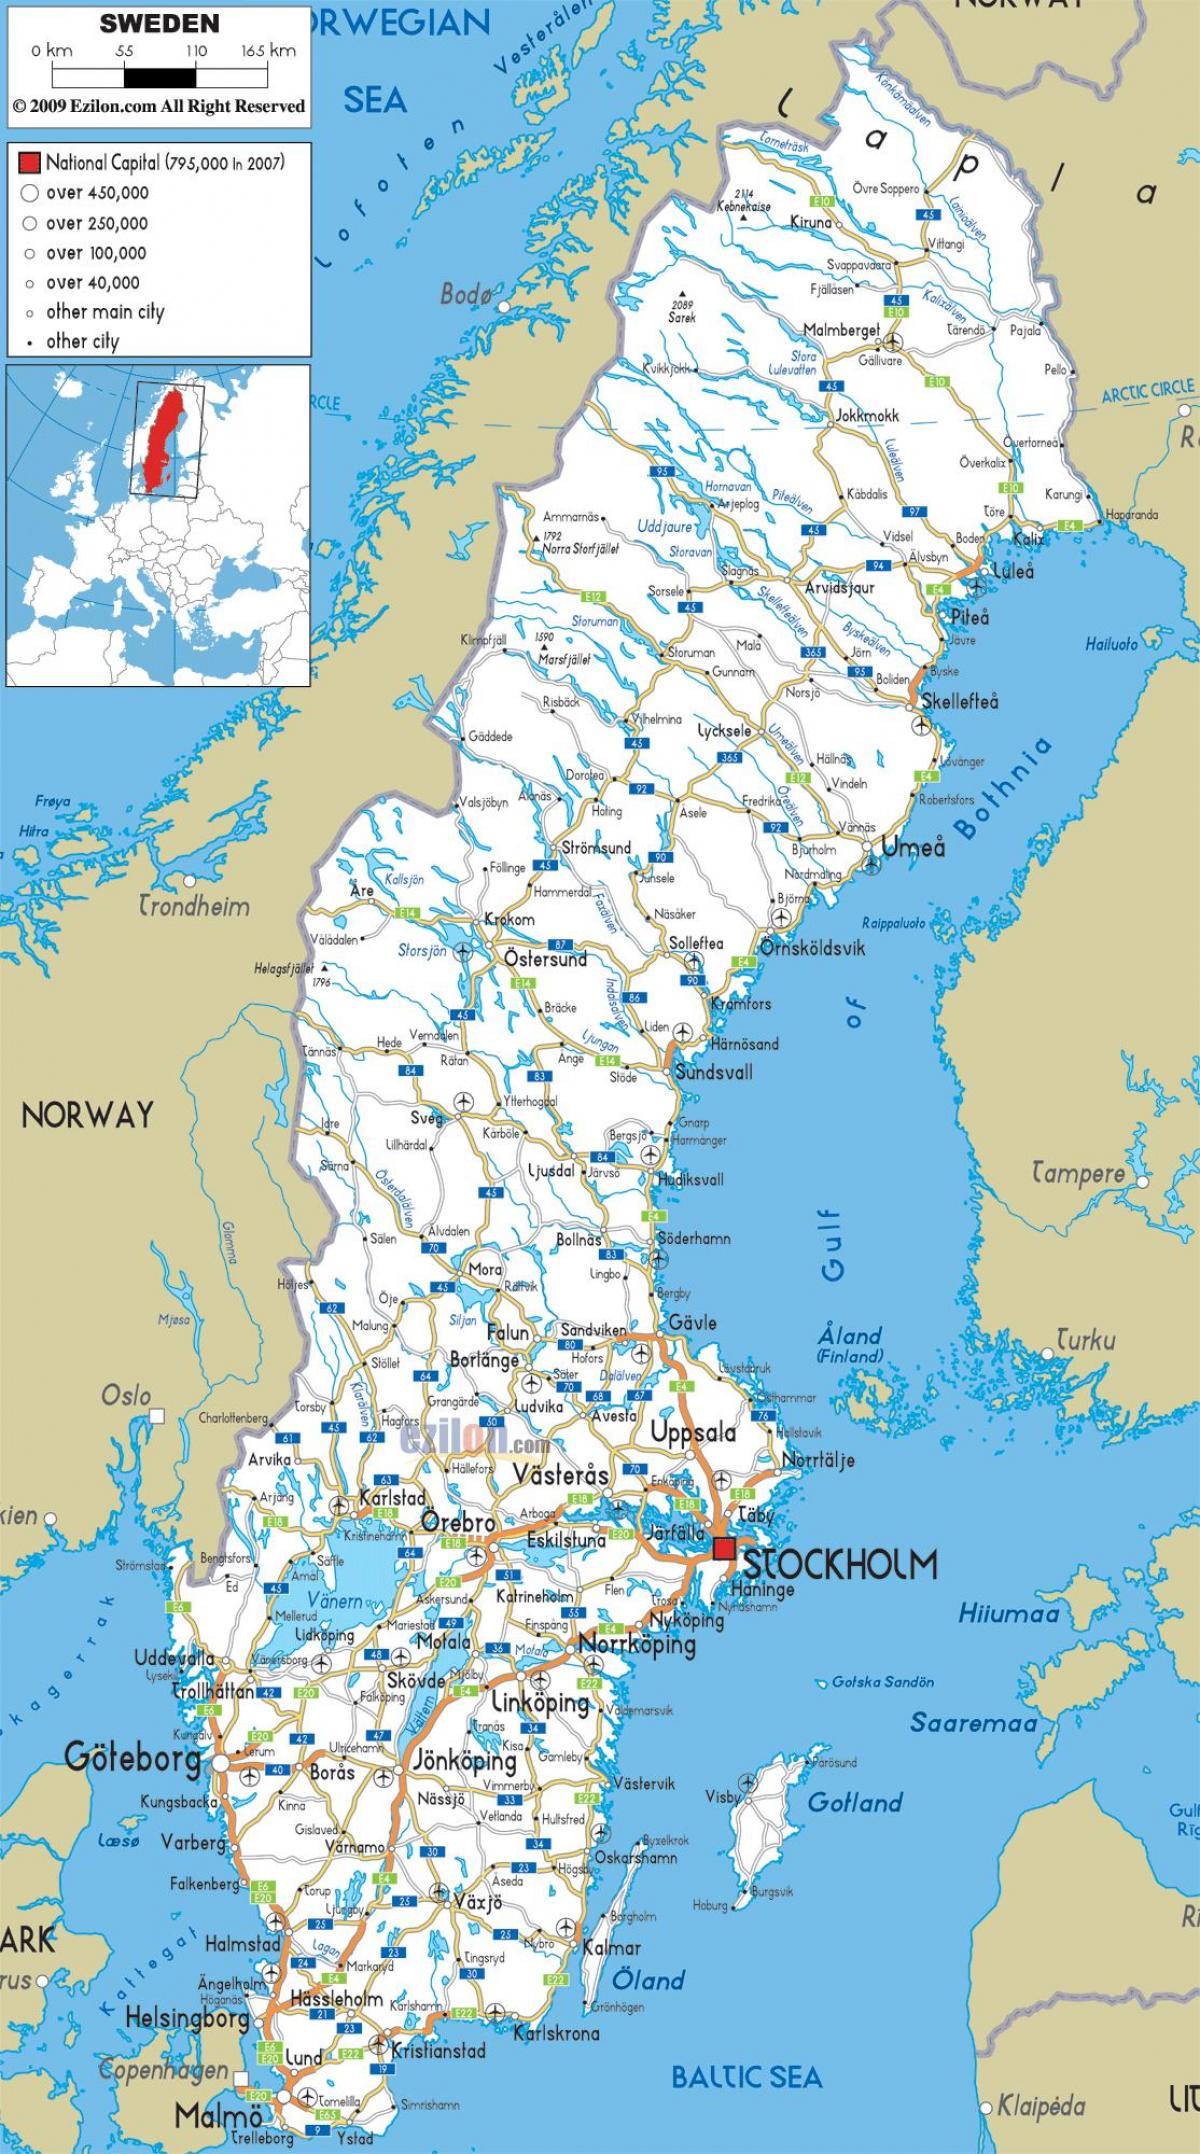 nord sverige kart Sverige byer kart   Sverige kart med byer (Northern Europe   Europe) nord sverige kart